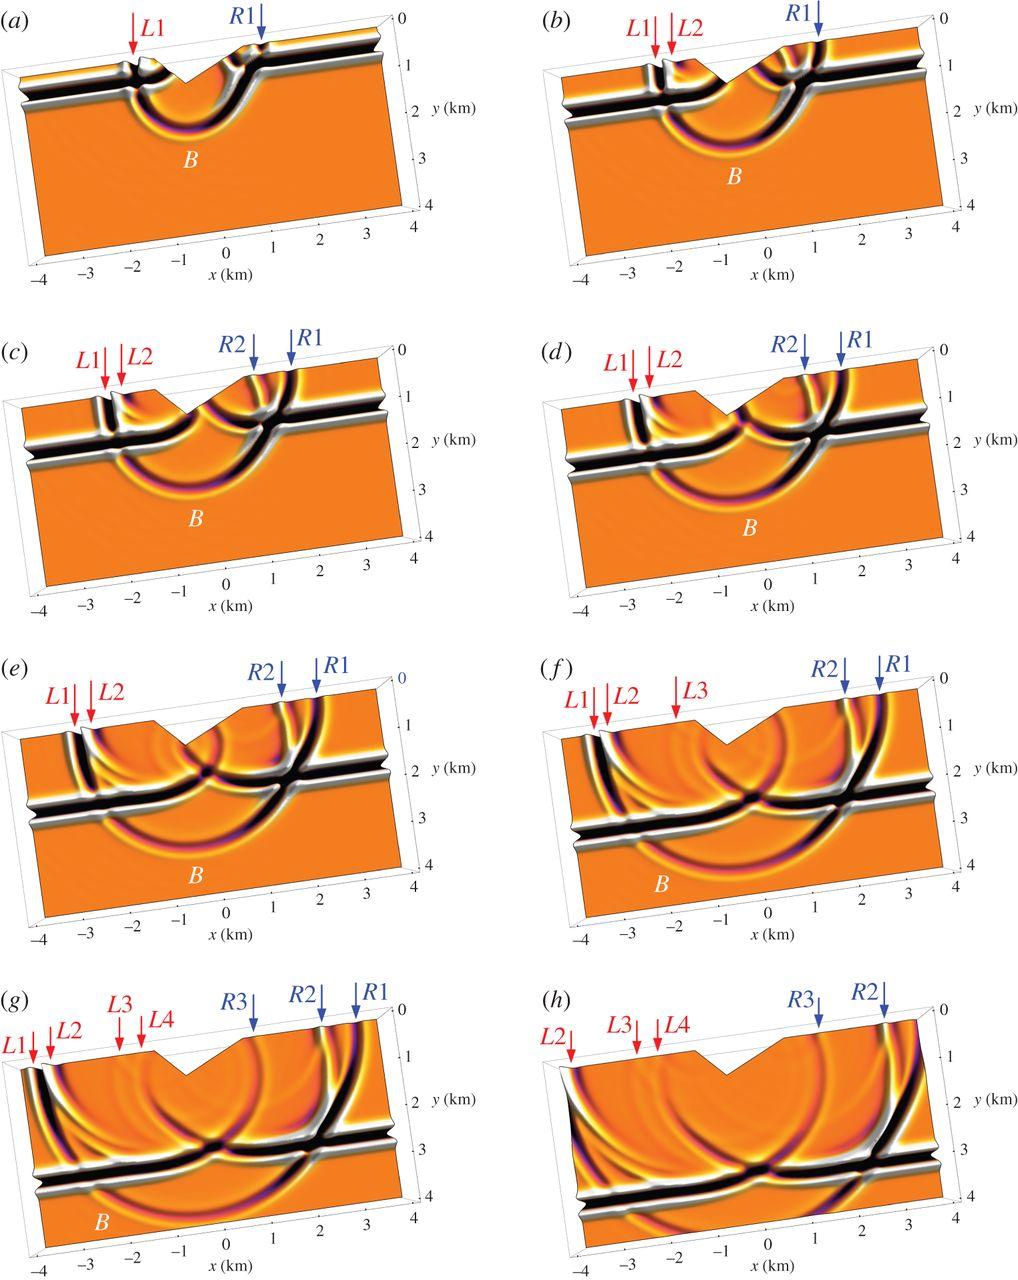 Response of a shallow asymmetric V.